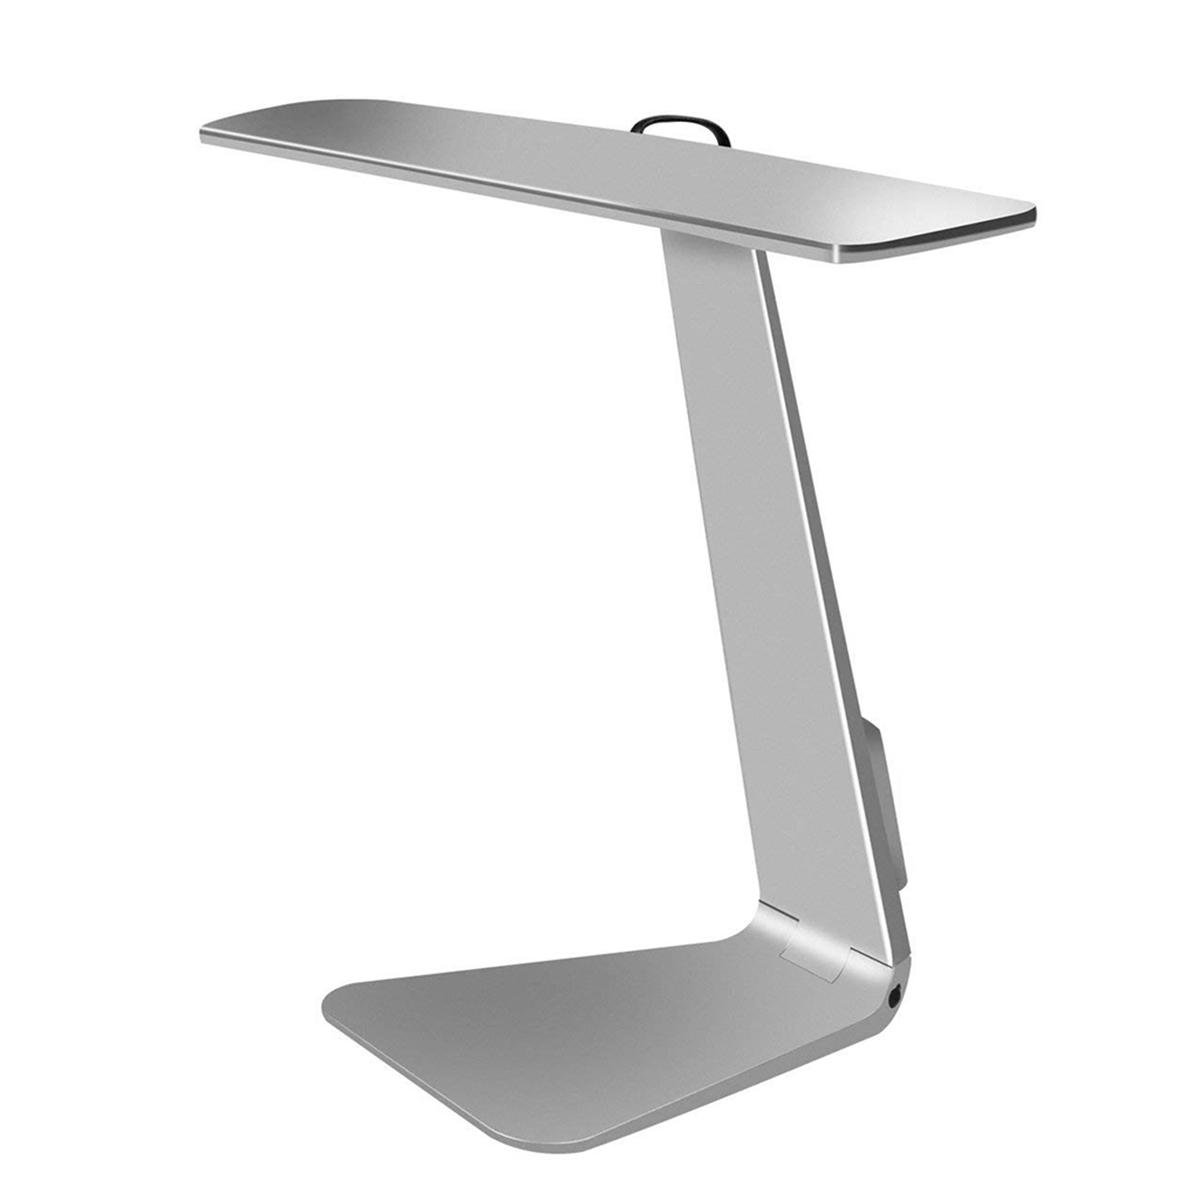 KOBWA Technological Sense LED Desk Lamp Reading Lamp,Portable Eye-Caring Table Lamps,Desk Light with USB Charging Port,3 Adjustable Brightness Level, Super Bright 200 LM Desk Lamp Work Up to 8 Hours